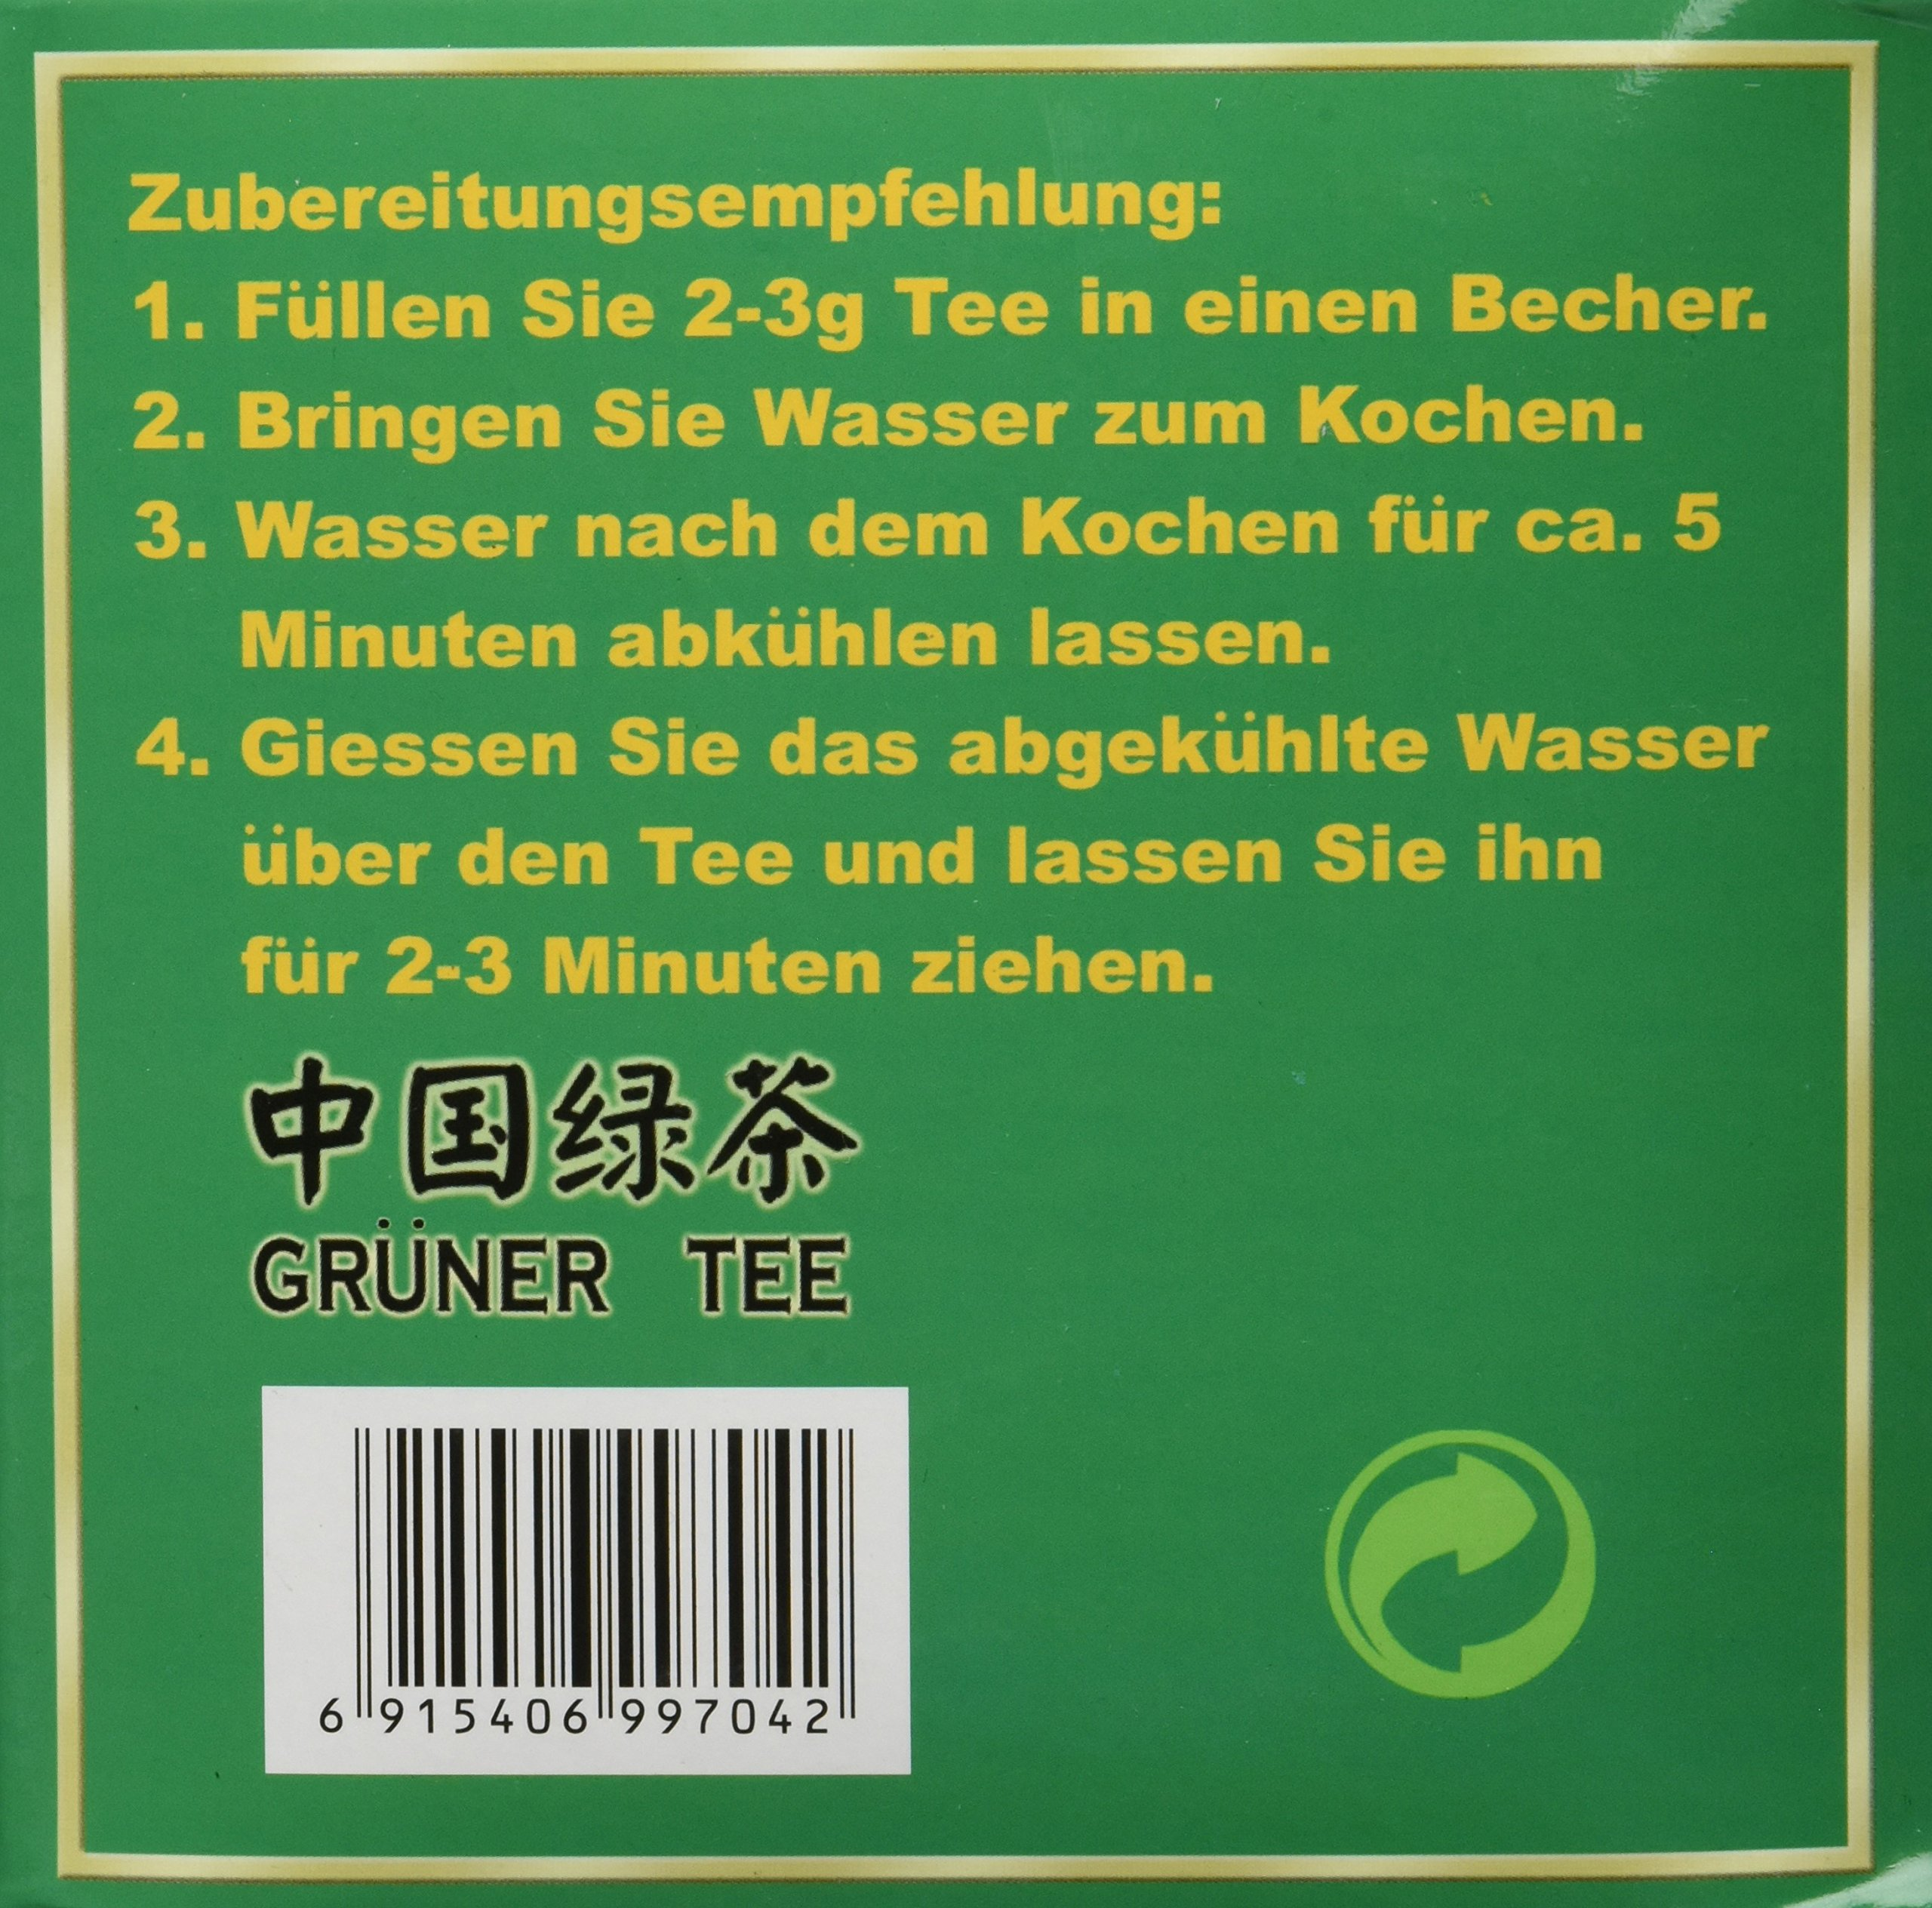 Greeting-Pine-Grner-Tee-1er-Pack-1-x-1-kg-Packung